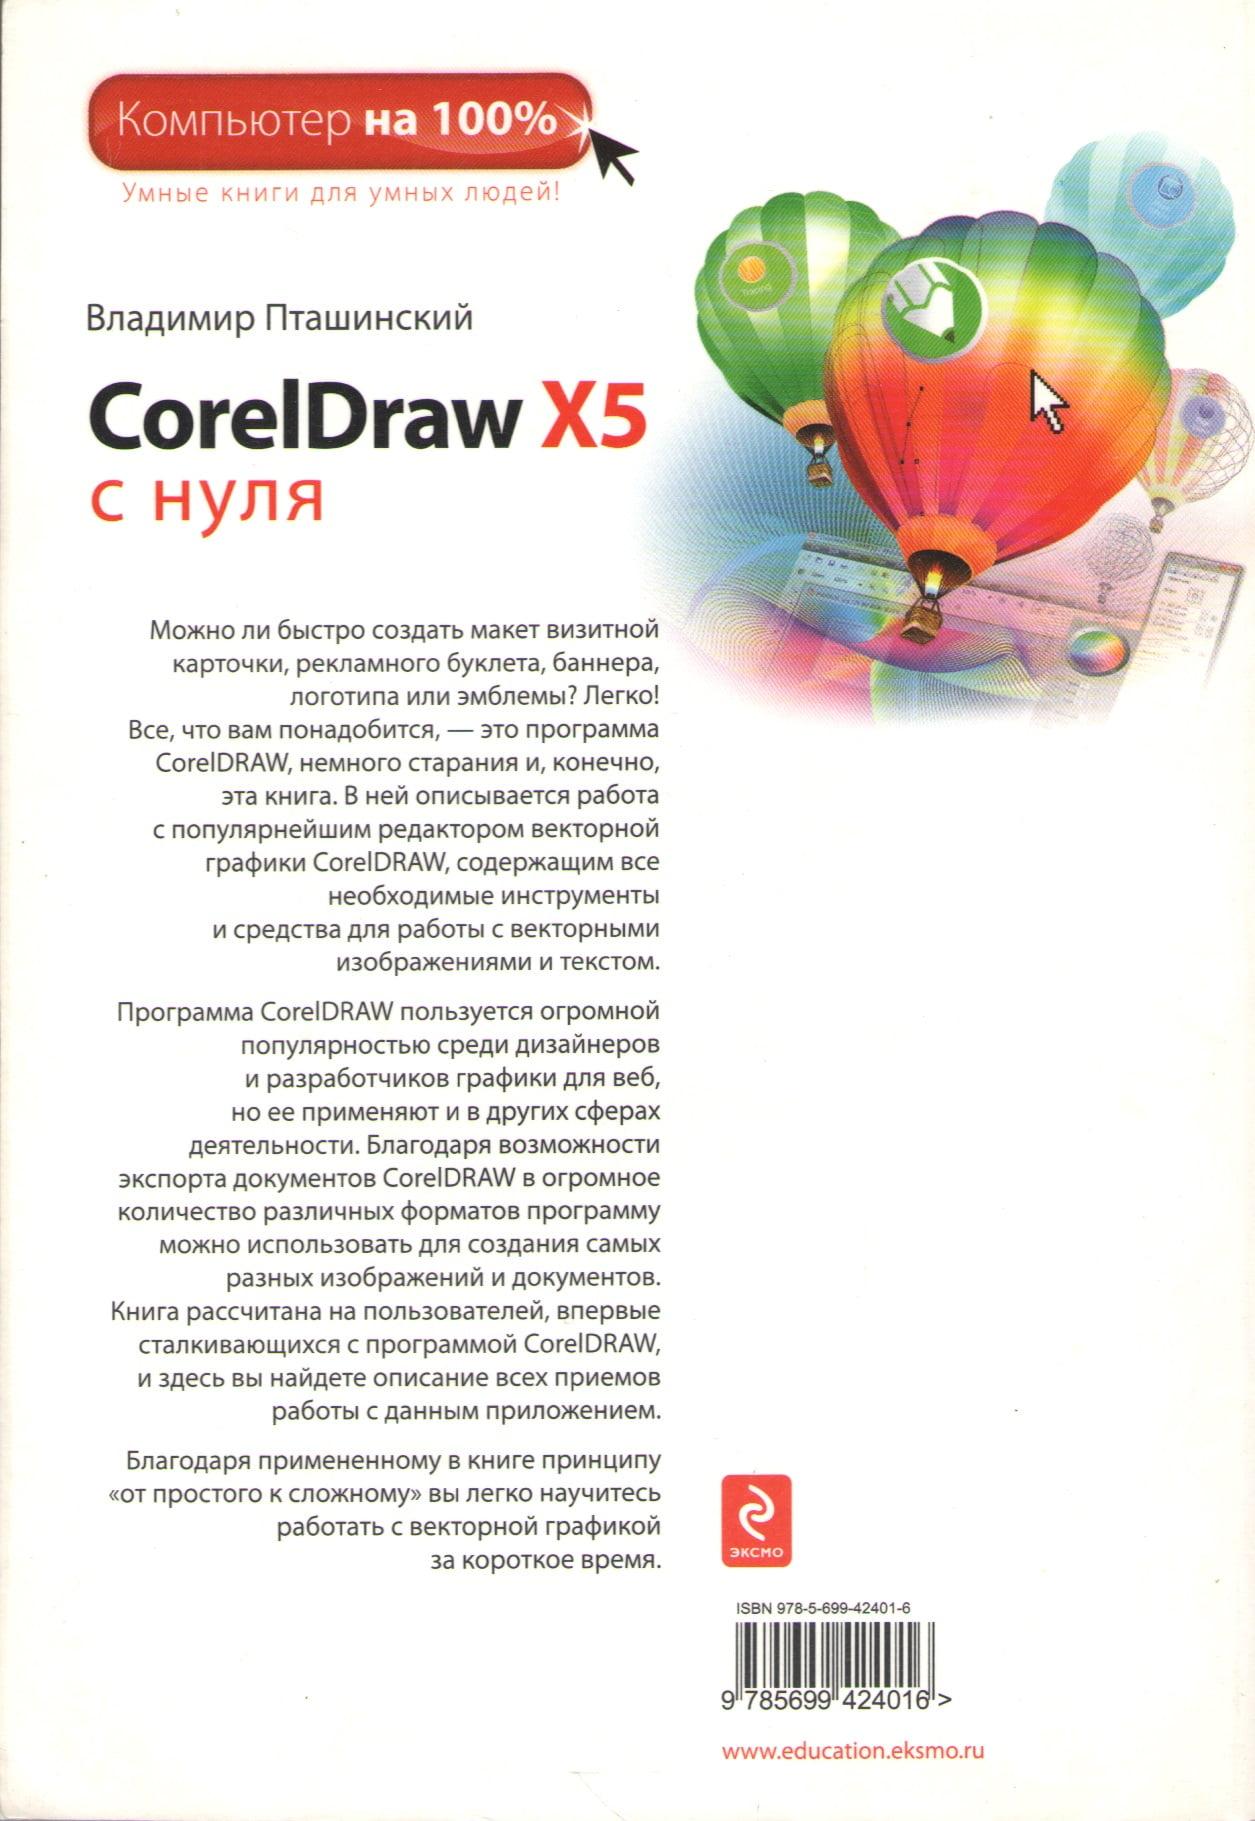 CorelDraw+X5+%D1%81+%D0%BD%D1%83%D0%BB%D1%8F - фото 2